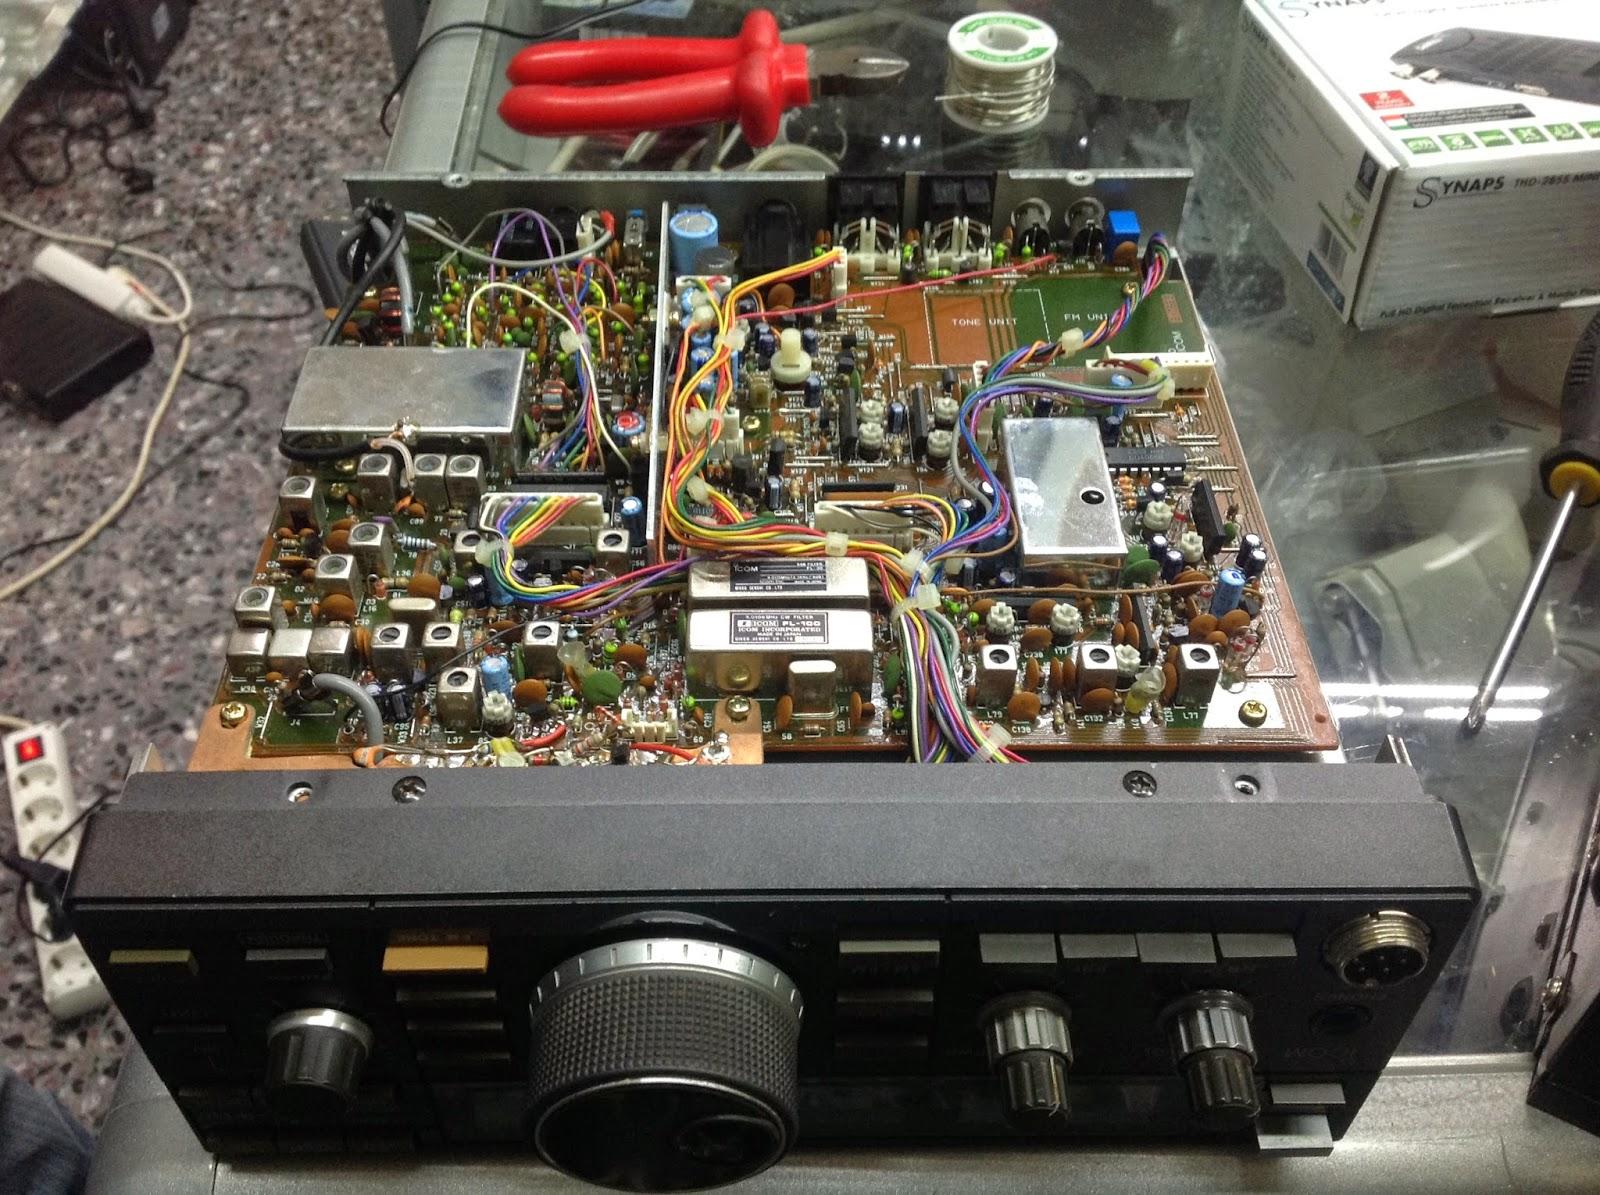 Sv5byr Icom Ic 725 Panadapter Mod